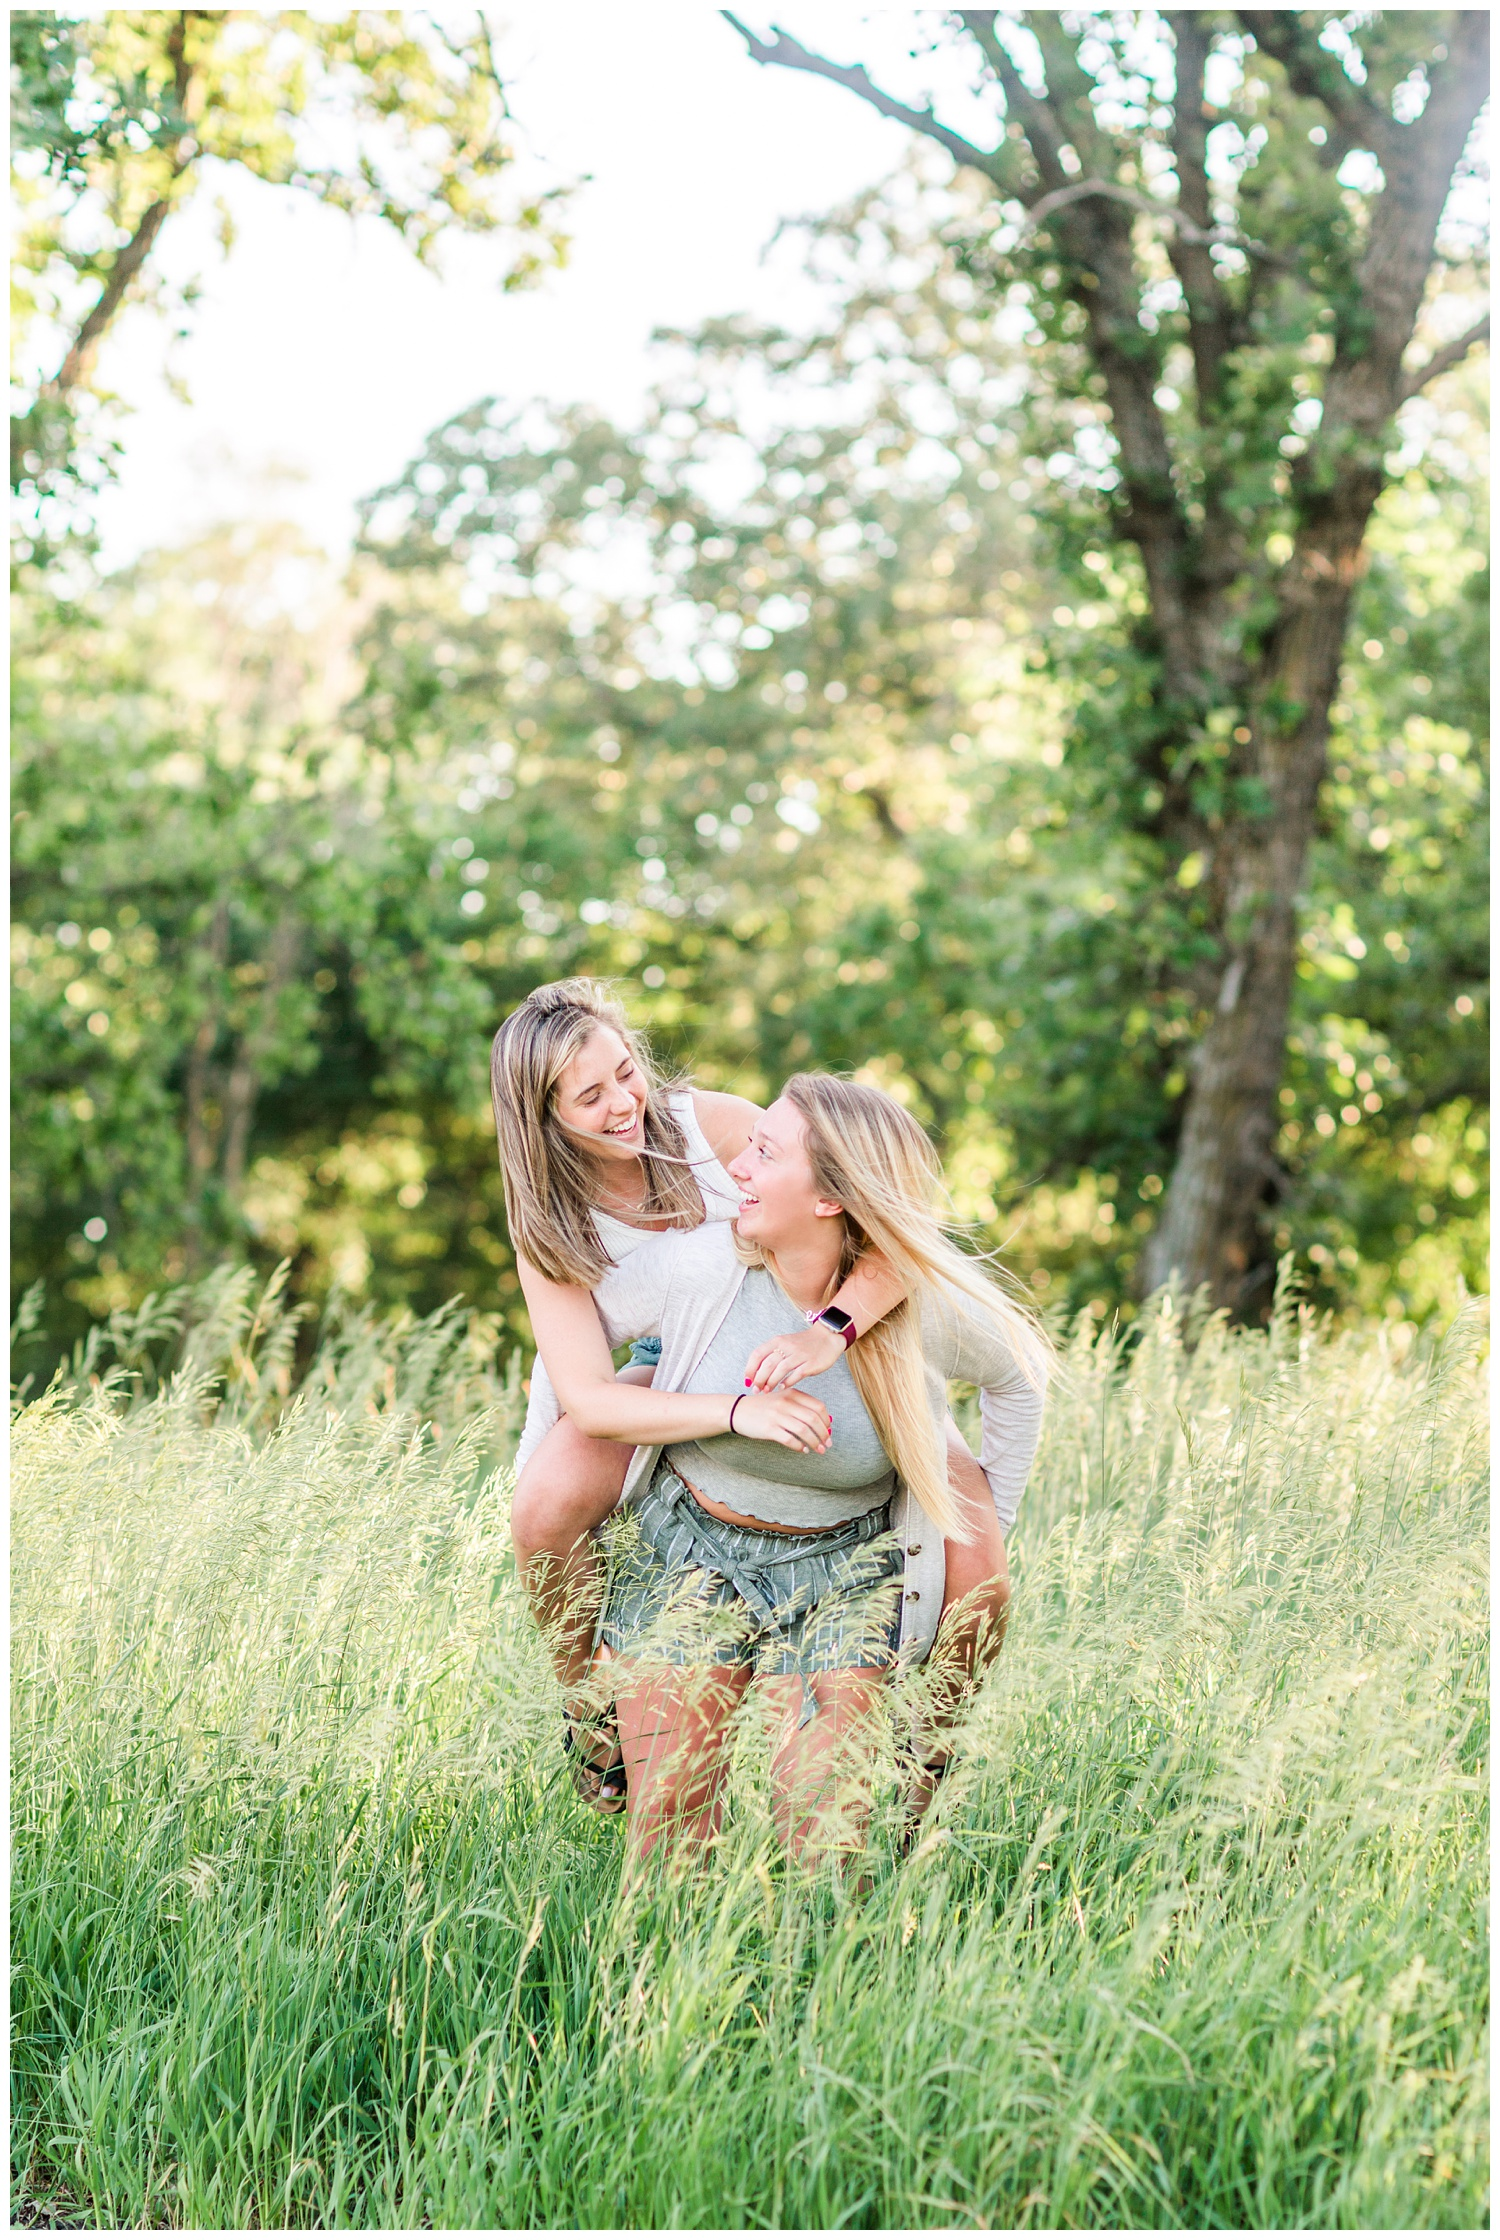 Senior girls best friends BFFs piggy back while laughing in a grassy field on a rural Iowa farm | CB Studio